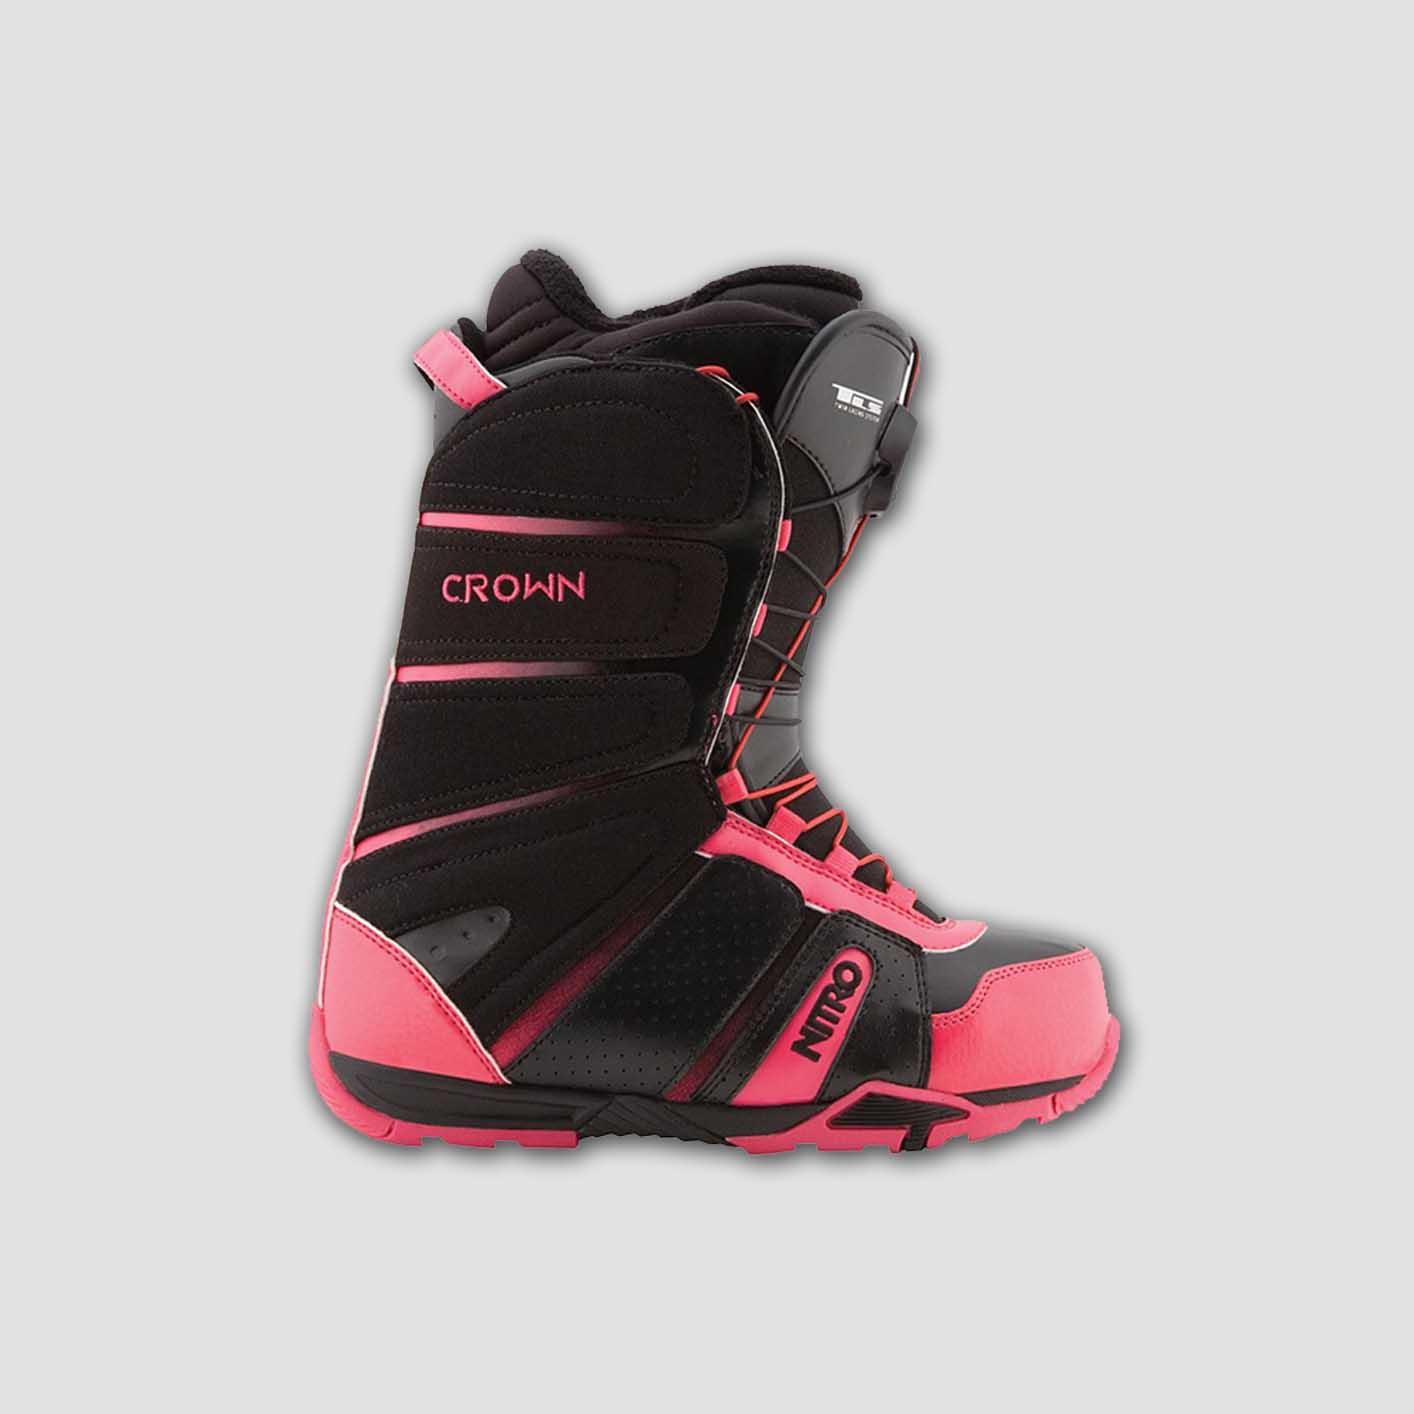 Nitro snowboard shoes